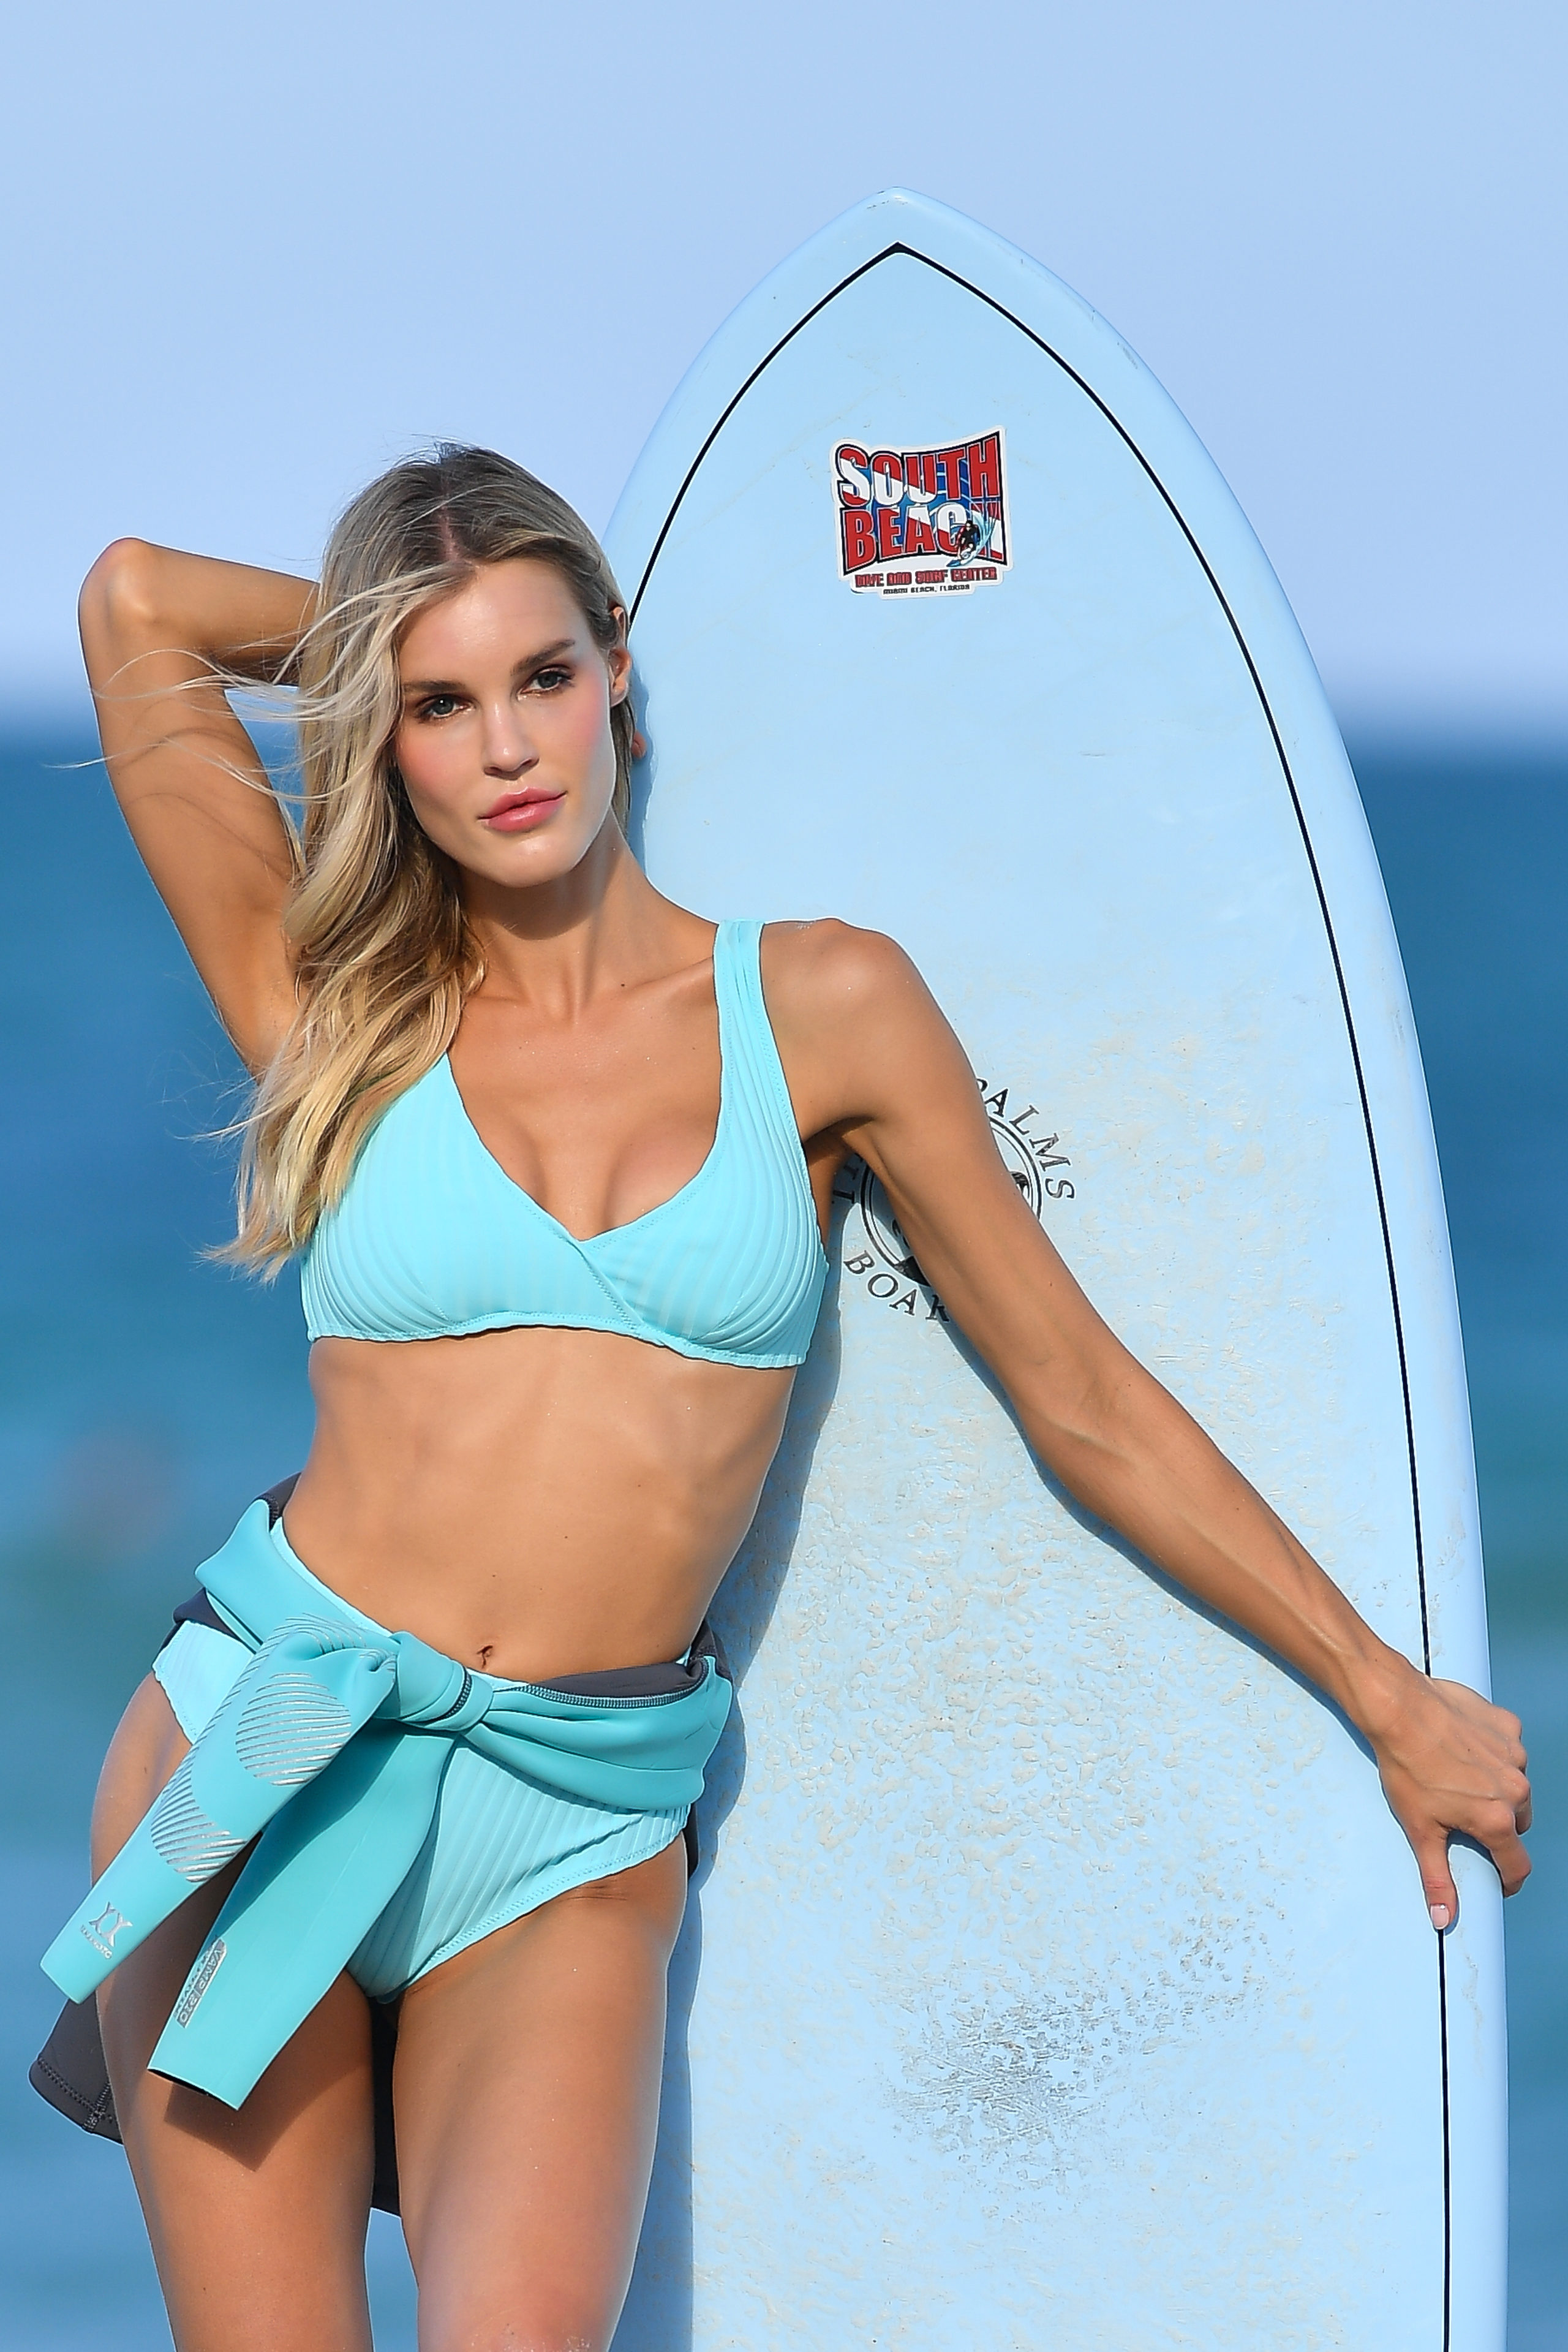 Model Joy Corrigan Location: Miami Beach, Florida Photo Credit: Robert O'Neil/SplashNews.com